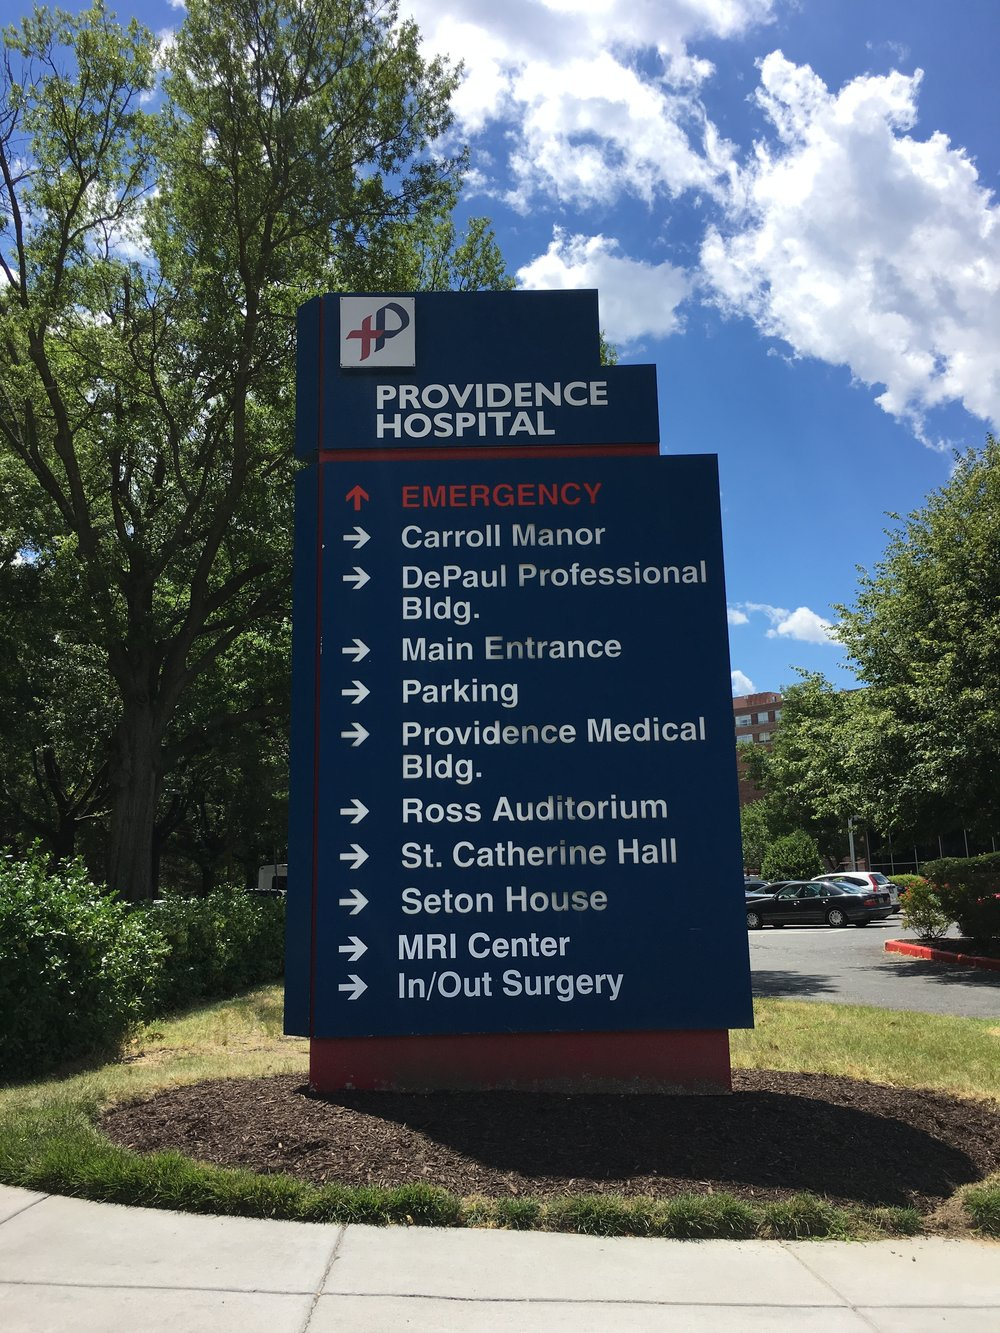 Providence Hospital - .4 miles